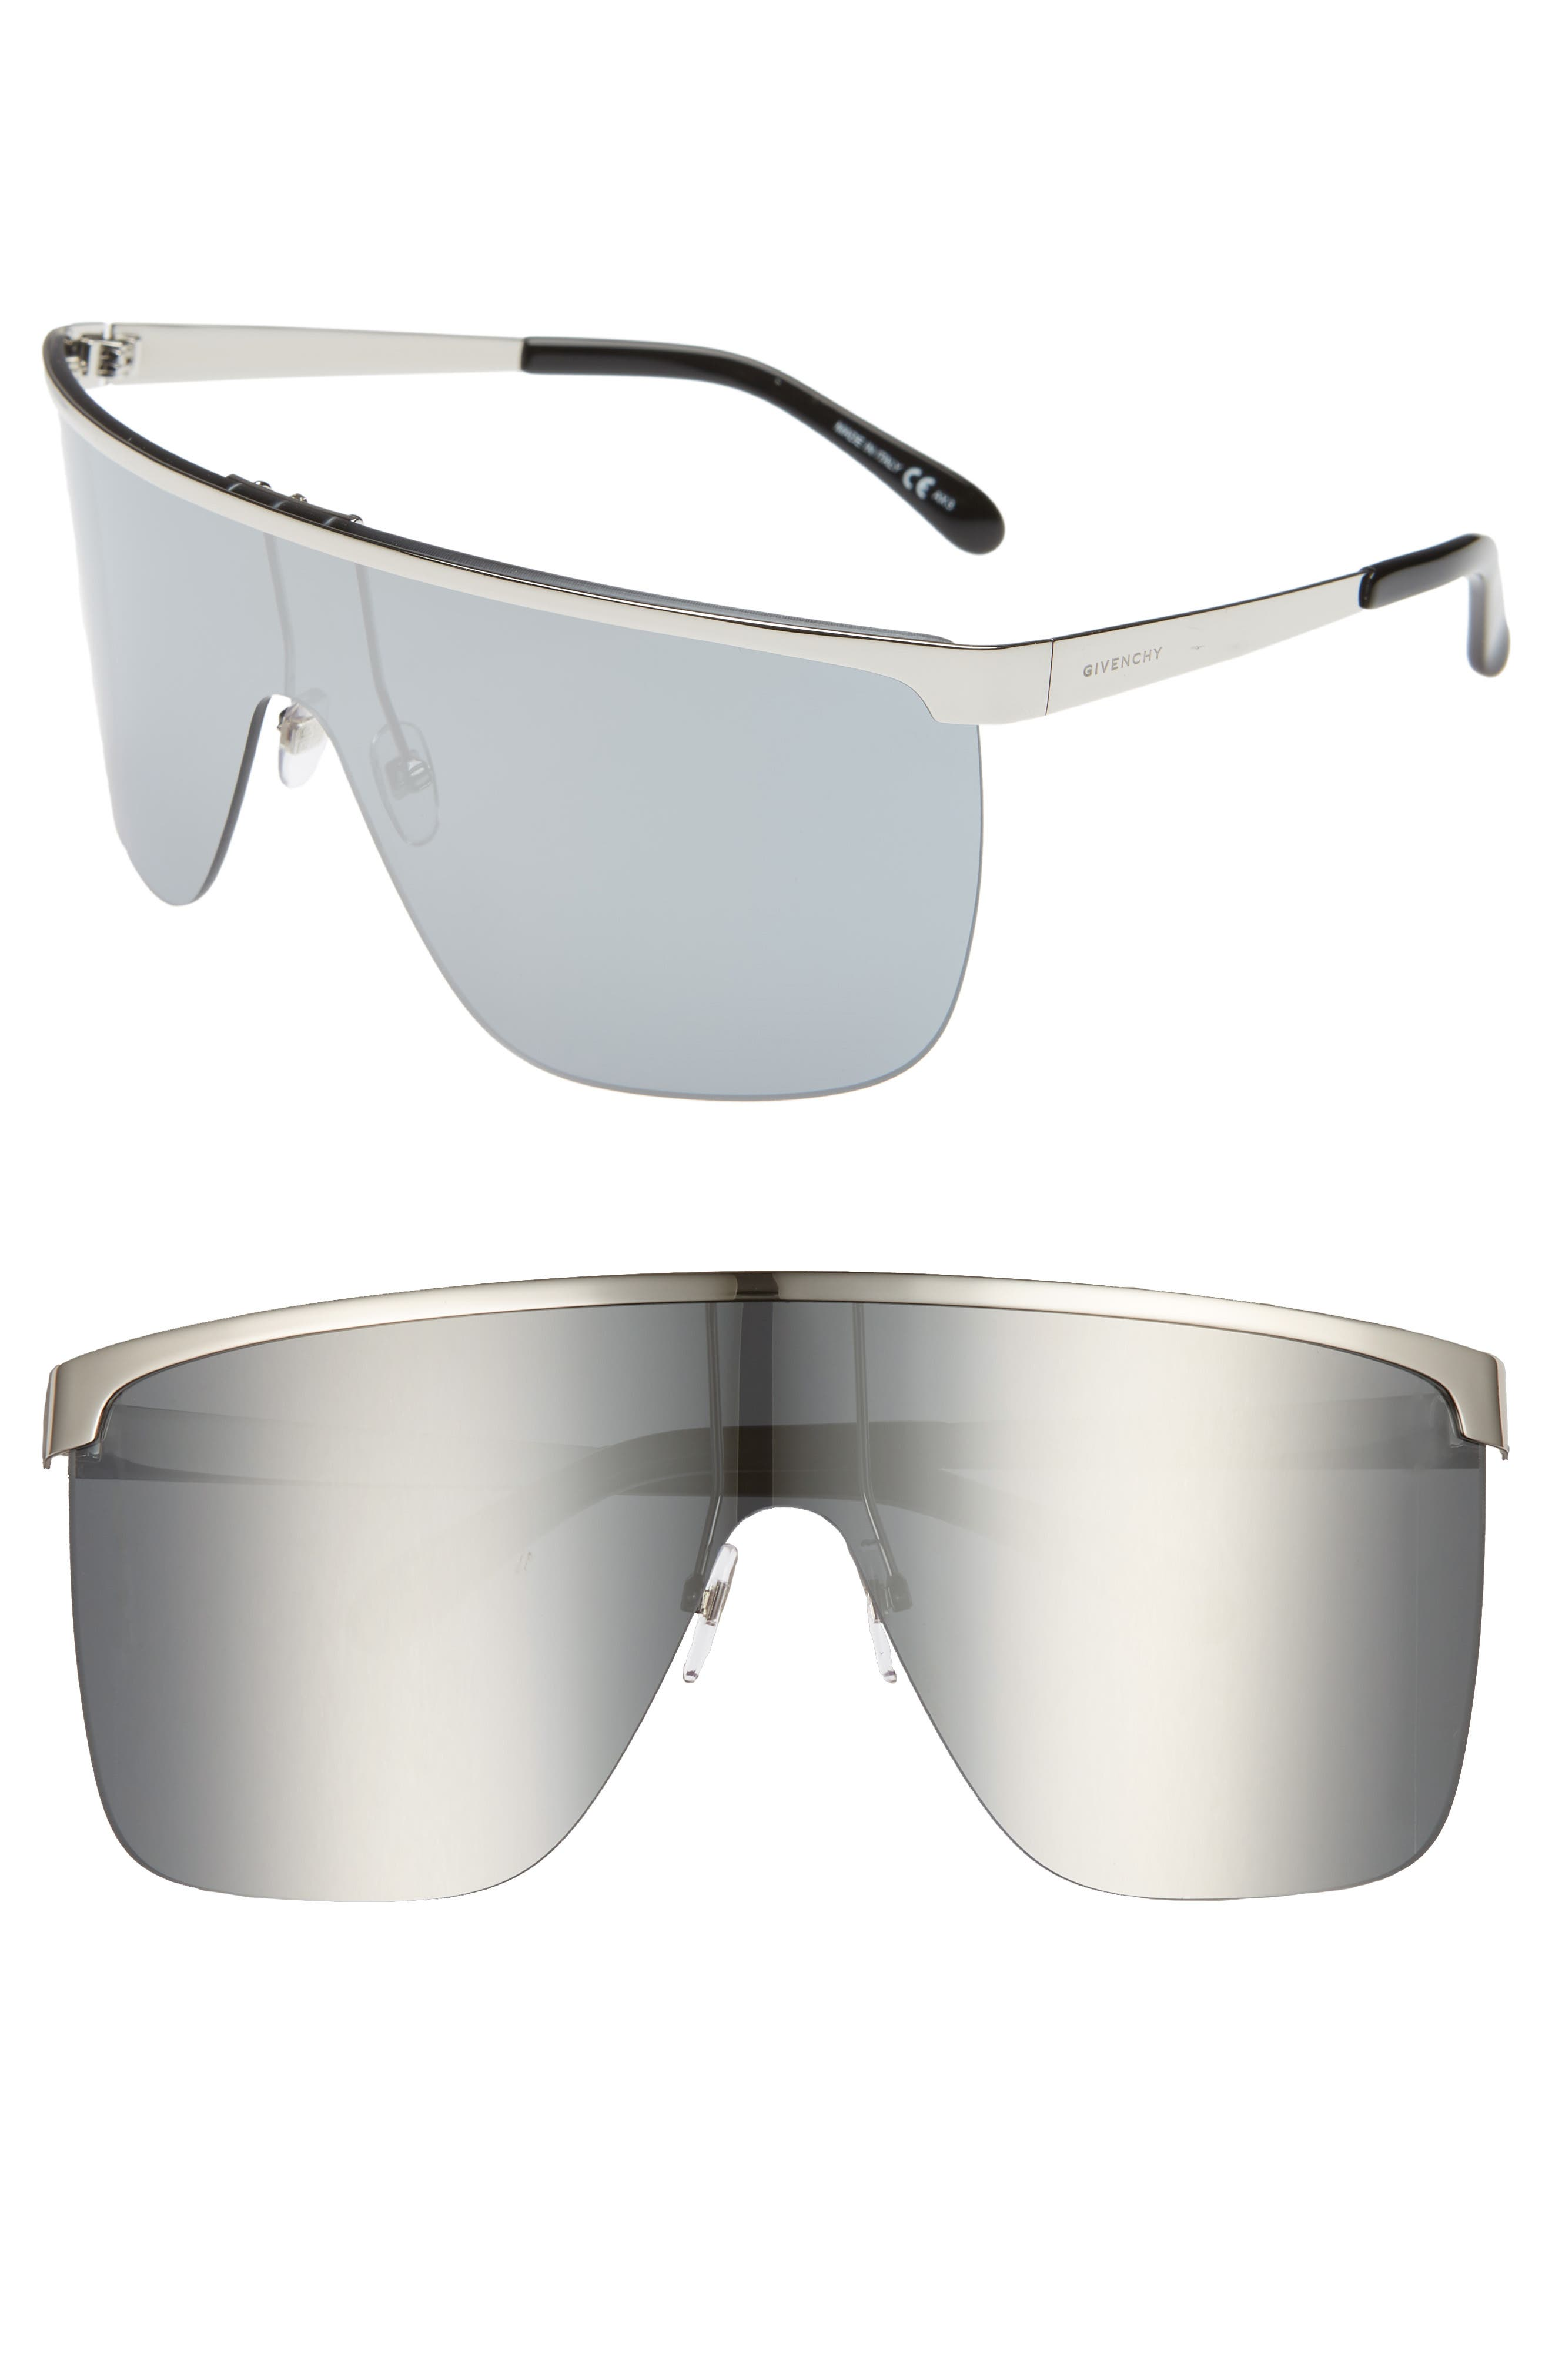 70mm Rimless Shield Sunglasses,                             Main thumbnail 1, color,                             PALLADIUM